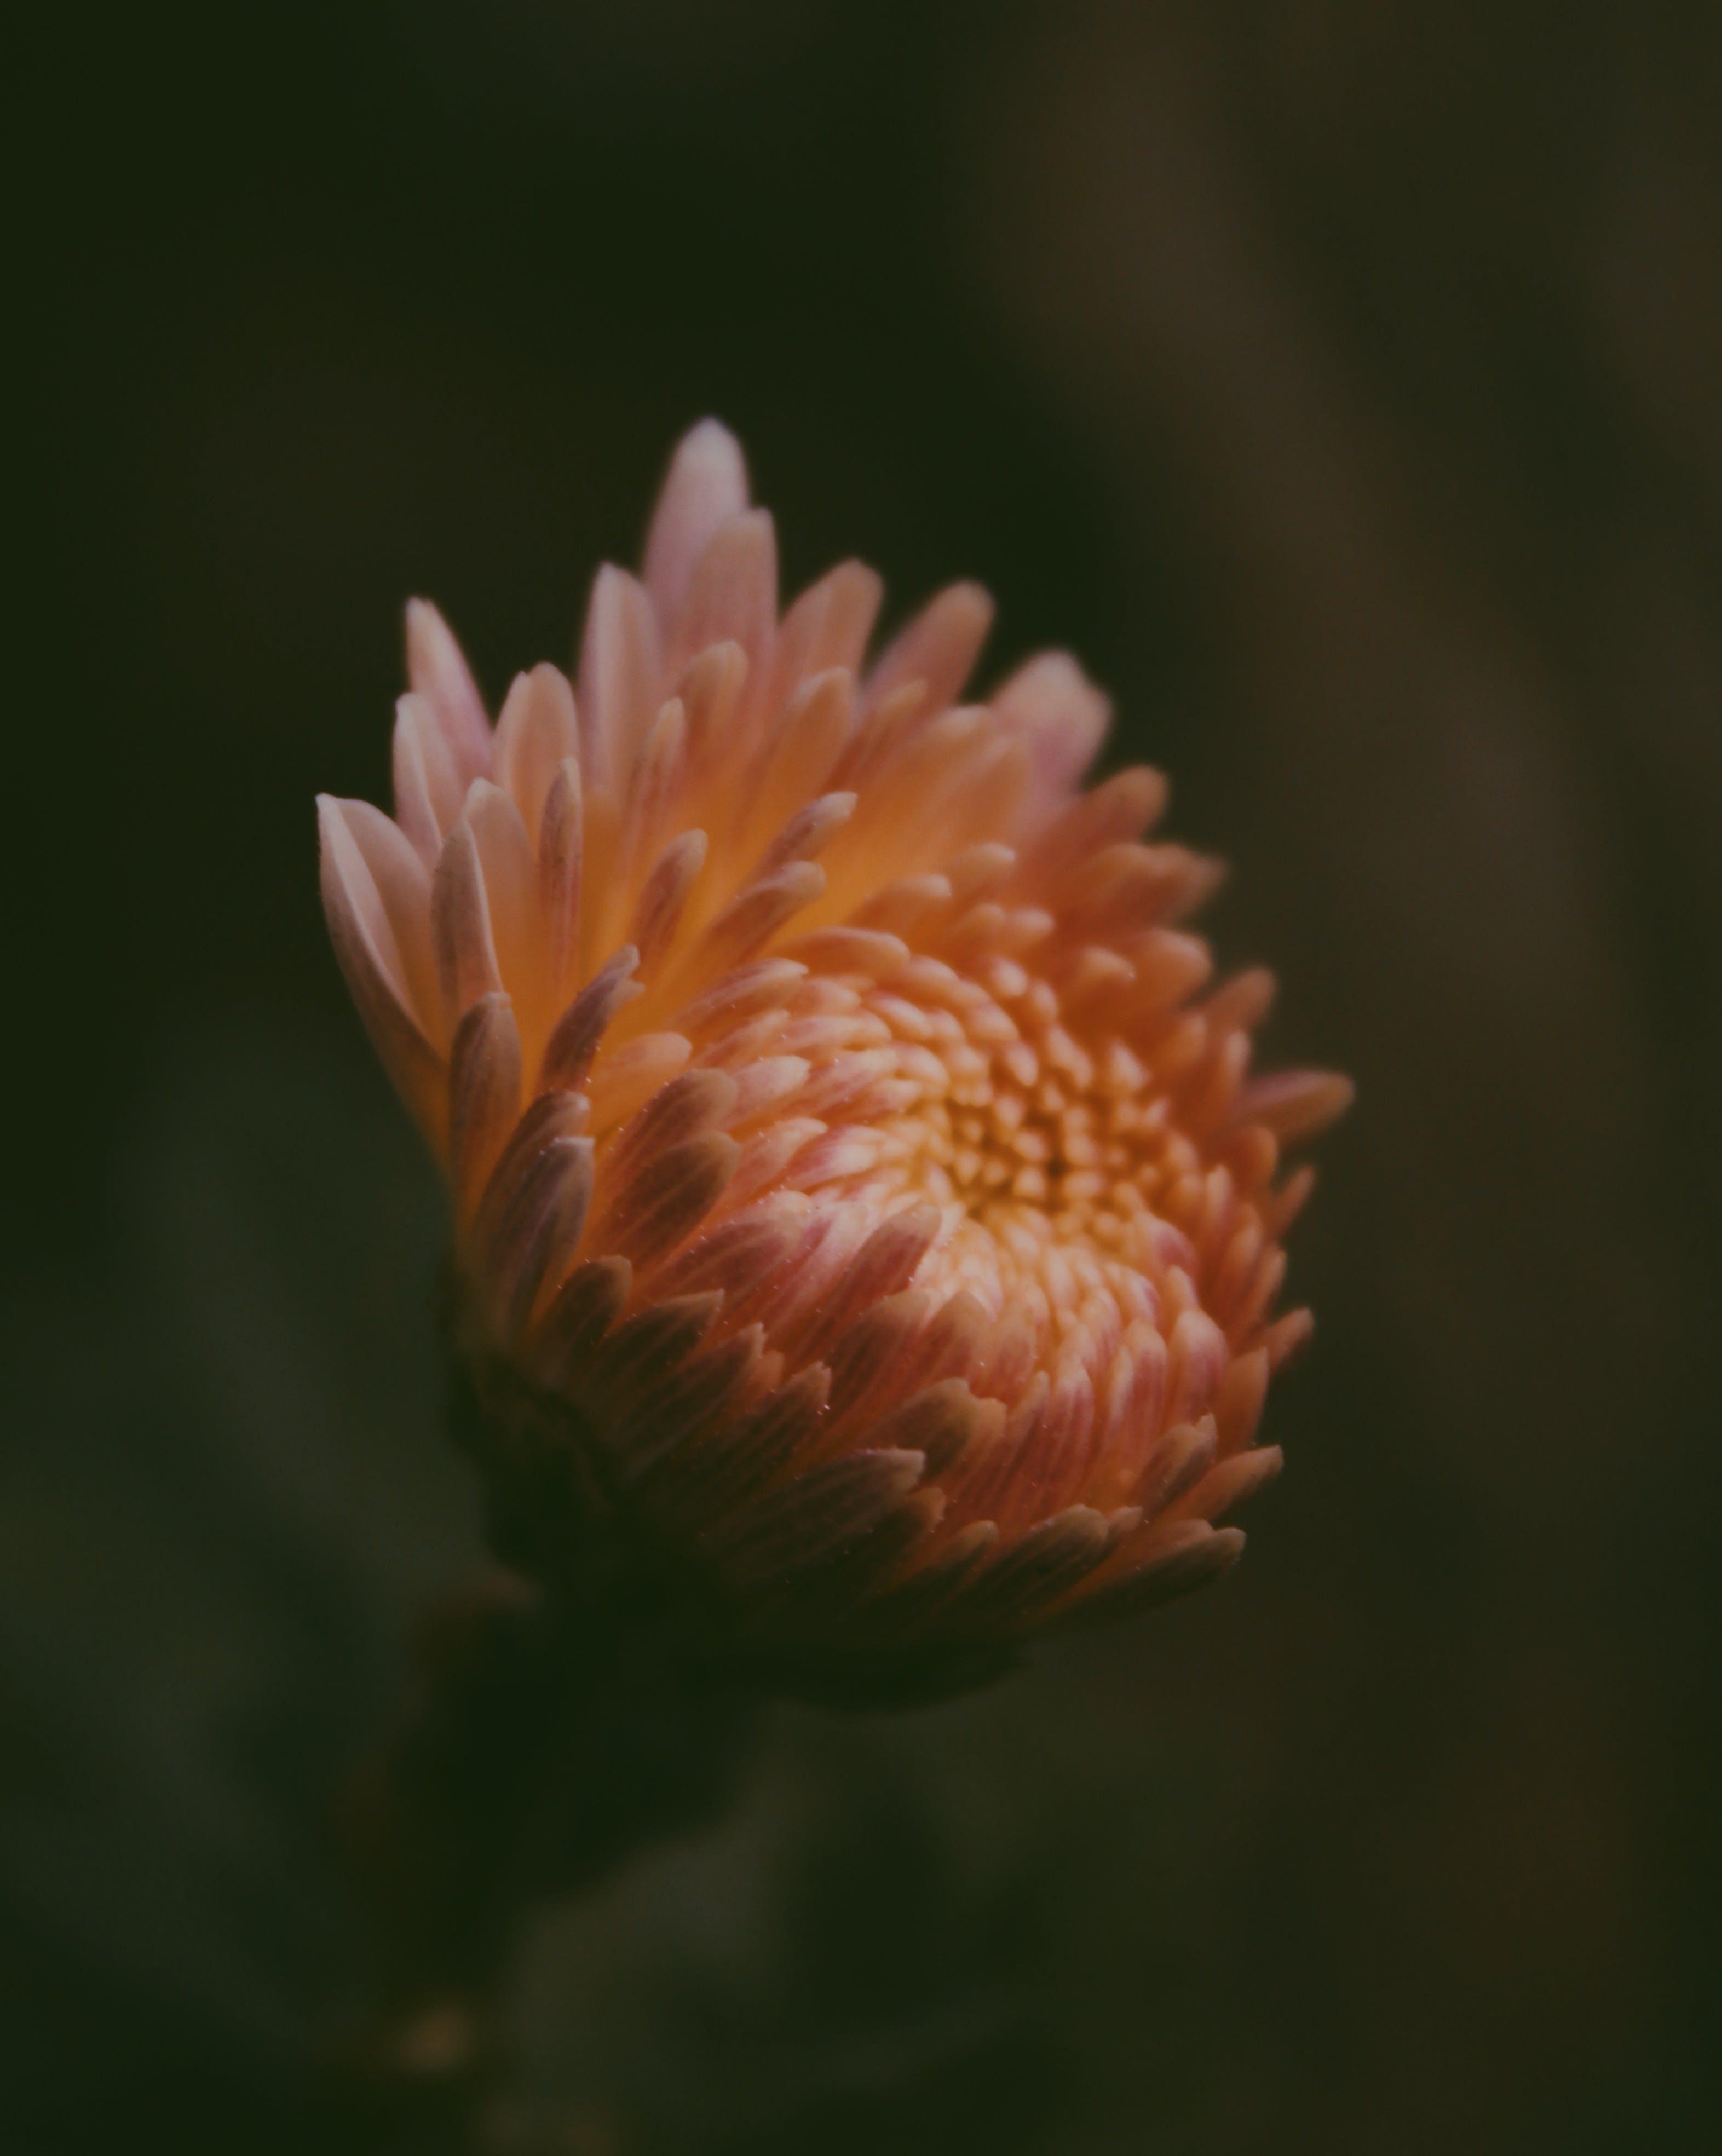 Close-up Photo of Orange Chrysanthemum Flower